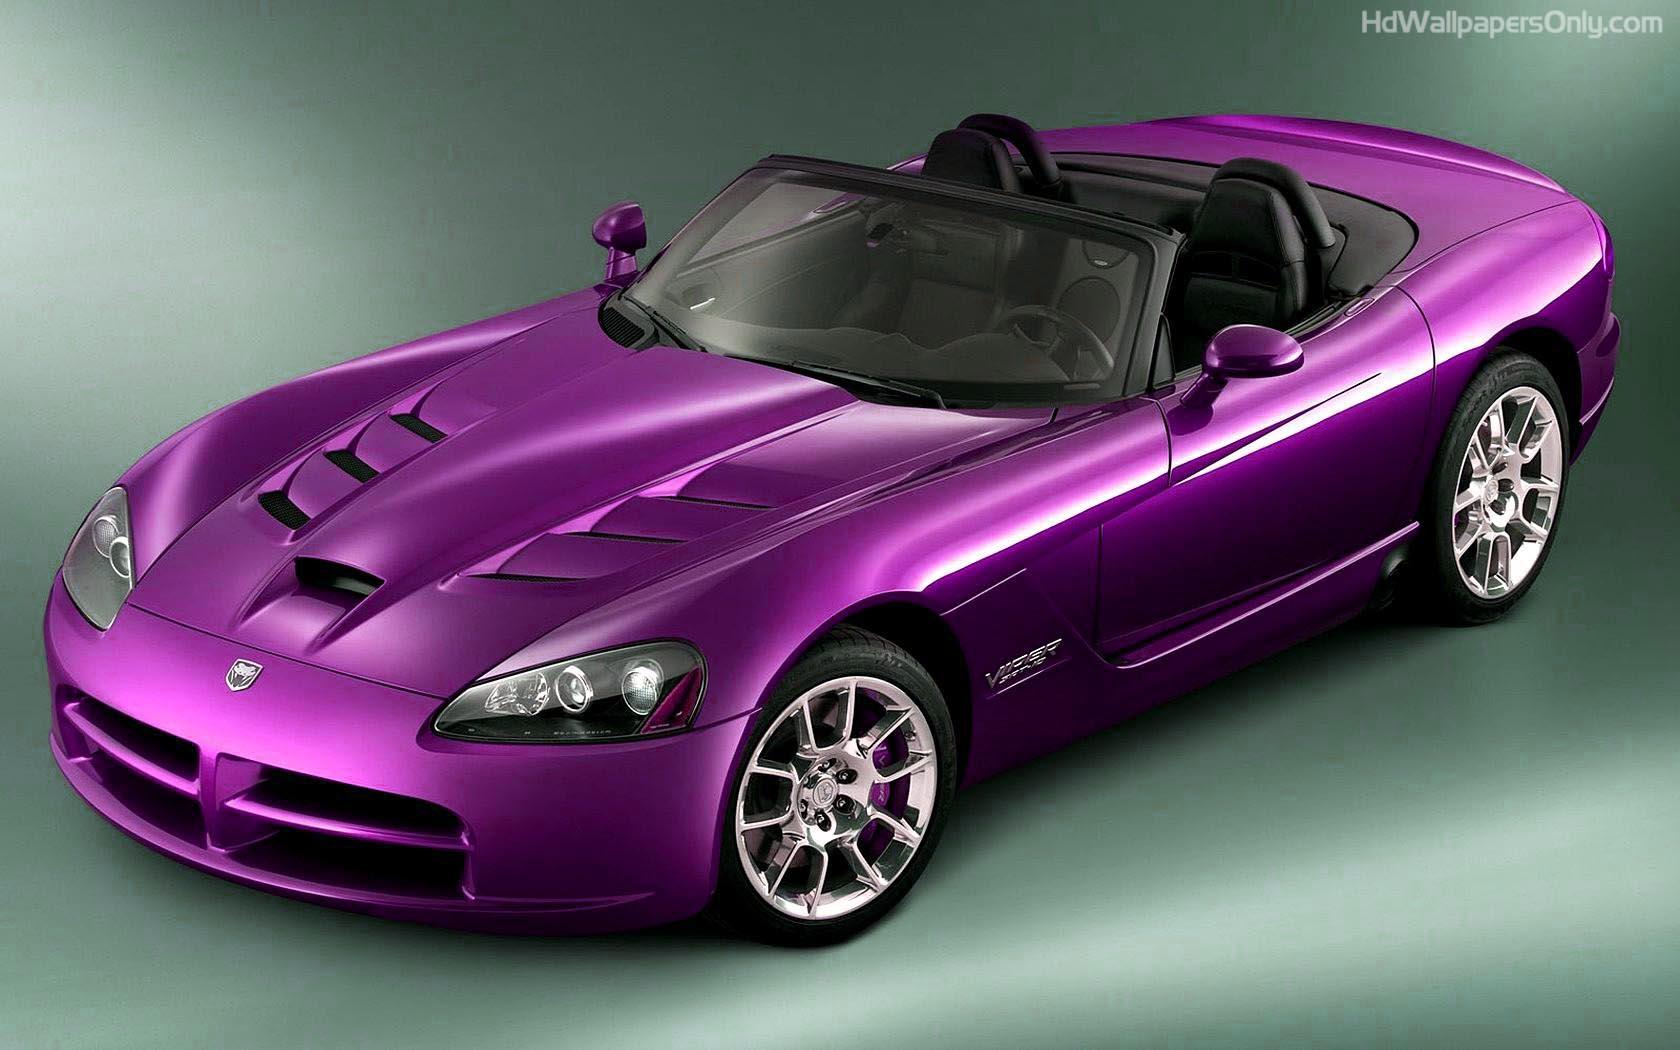 Pink And Black Sports Cars 5 Desktop Background ...